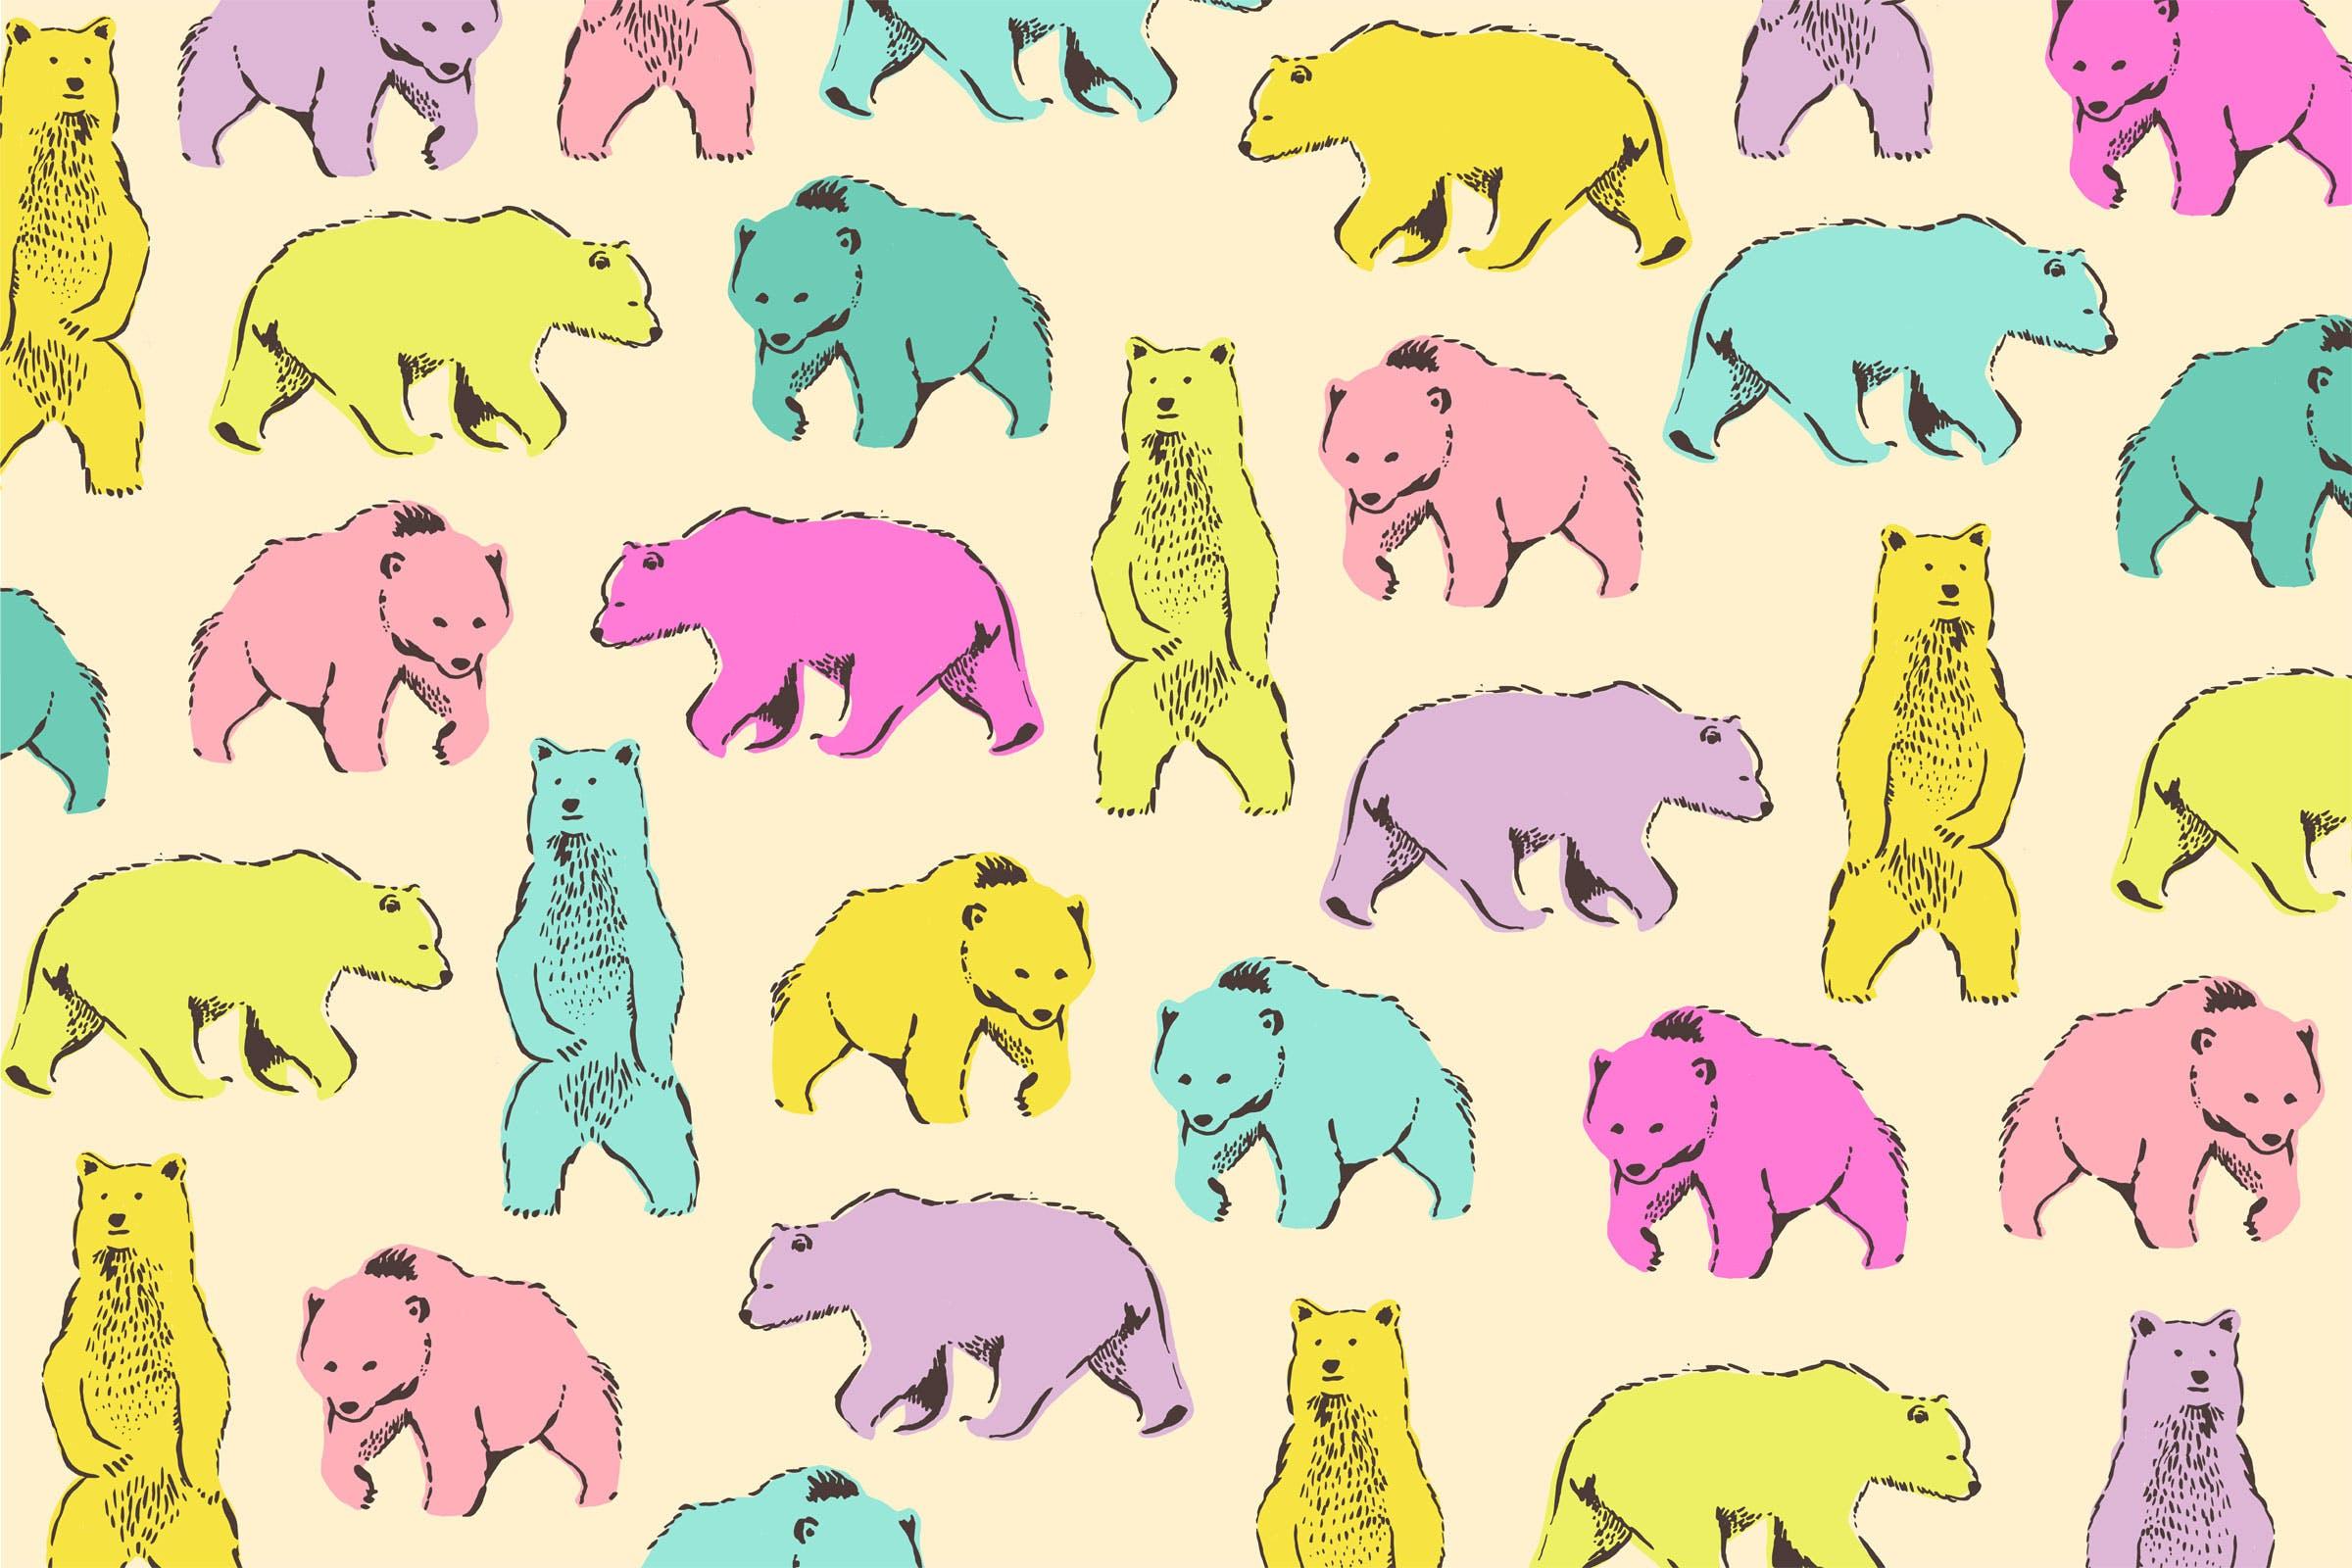 Quirky Desktop Wallpapers   Top Quirky Desktop Backgrounds 2400x1600